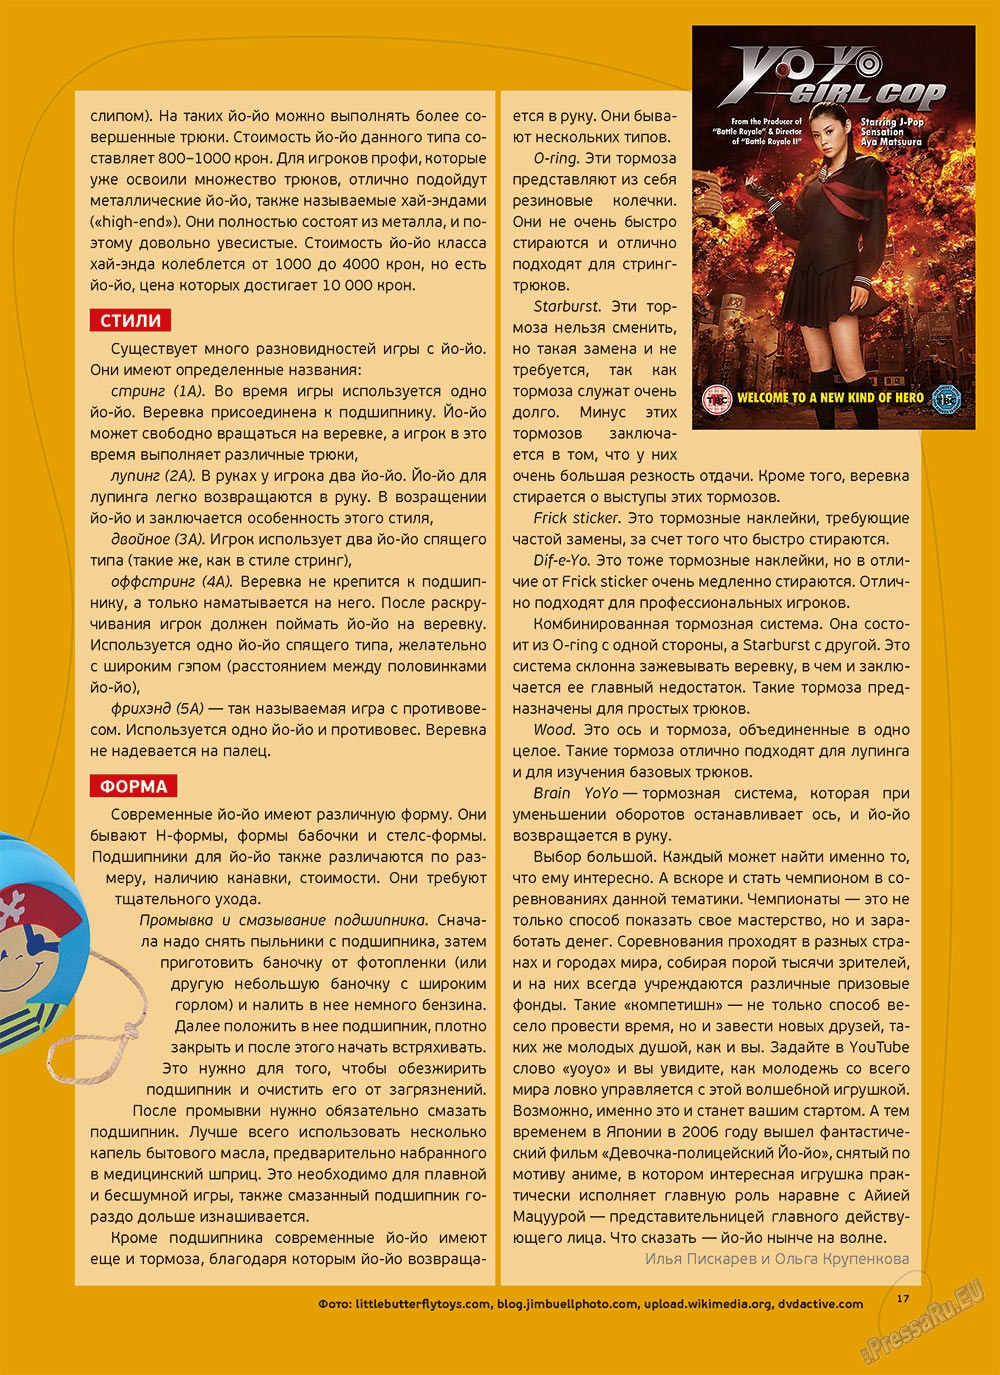 Артек (журнал). 2012 год, номер 5, стр. 19